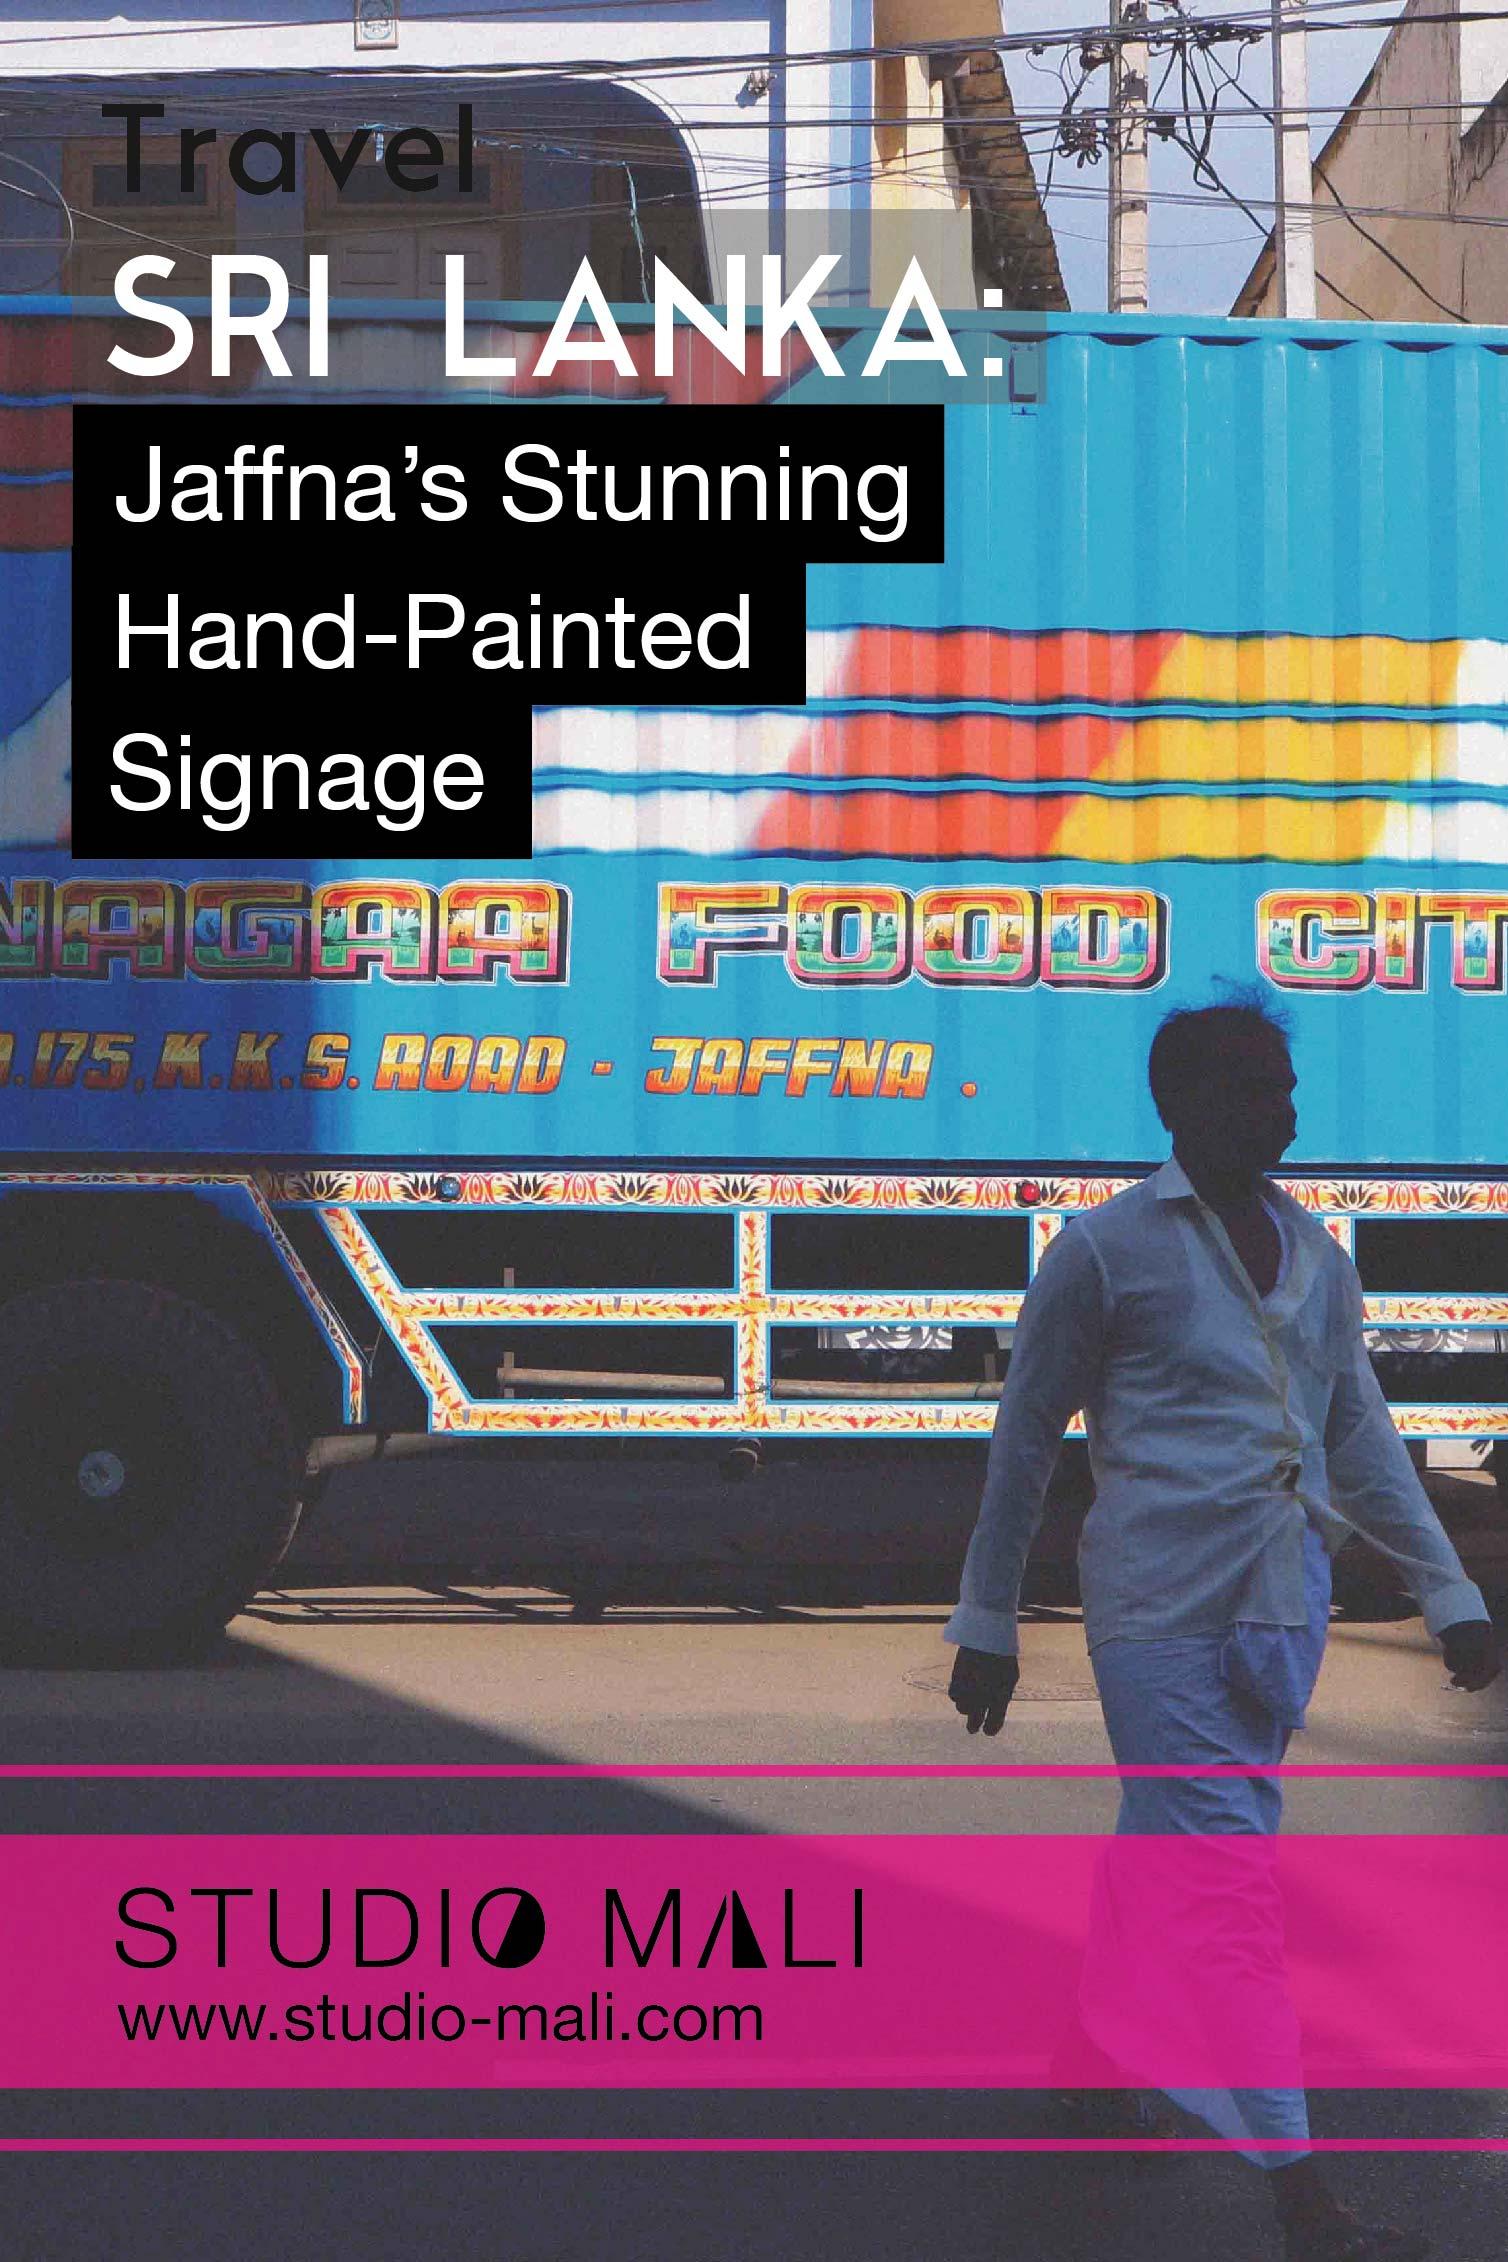 Sri Lanka - Jaffna's Hand-Painted Signage, By Studio Mali.jpg